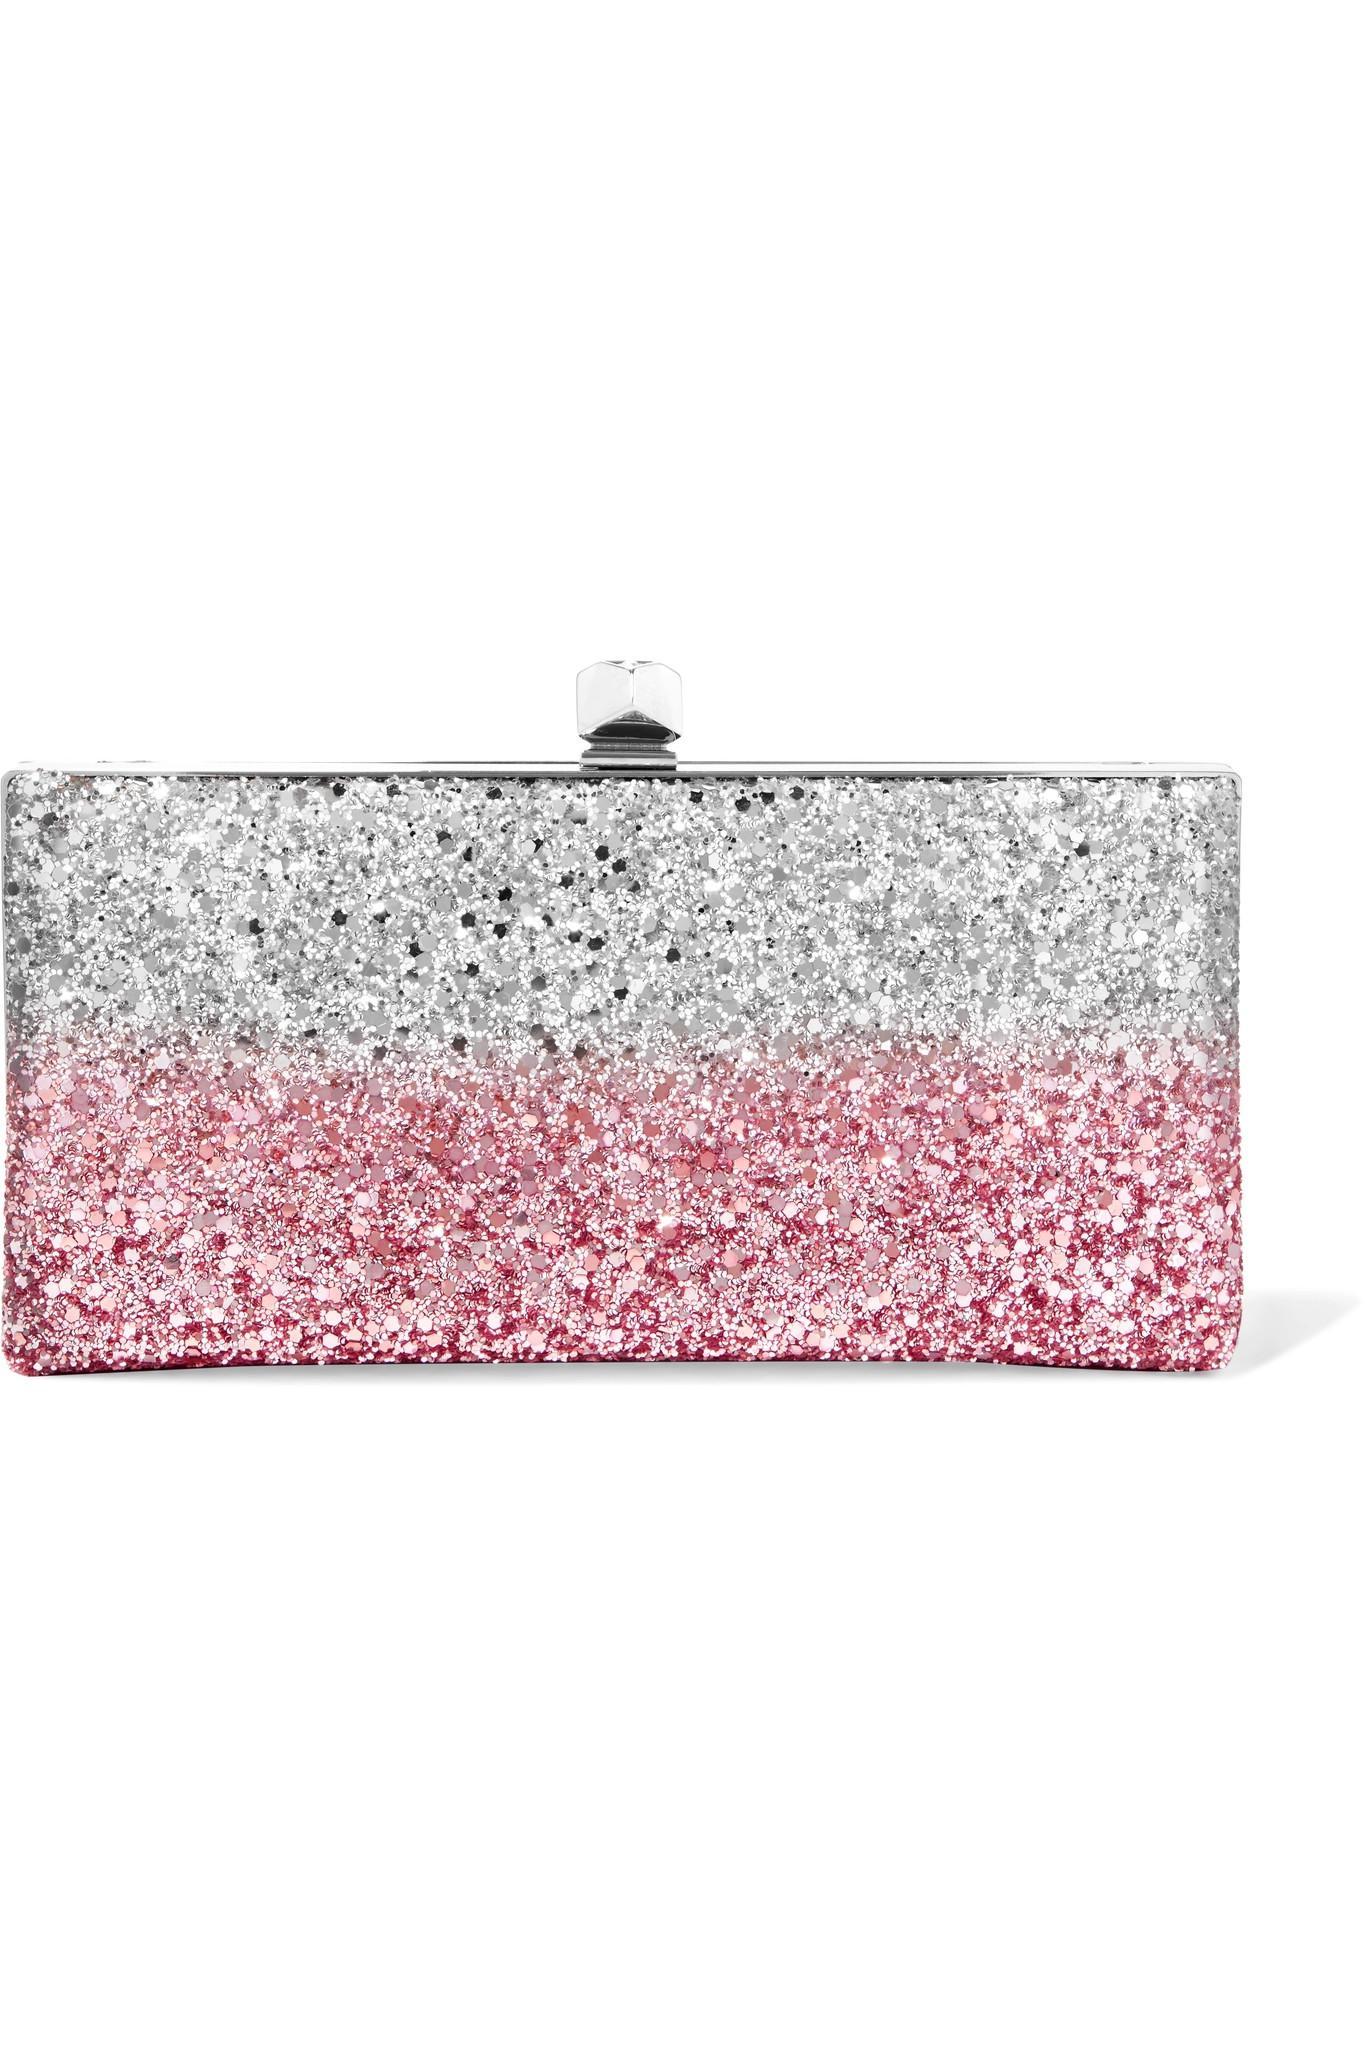 J Box Glittered Canvas Clutch - Silver Jimmy Choo London hAkks